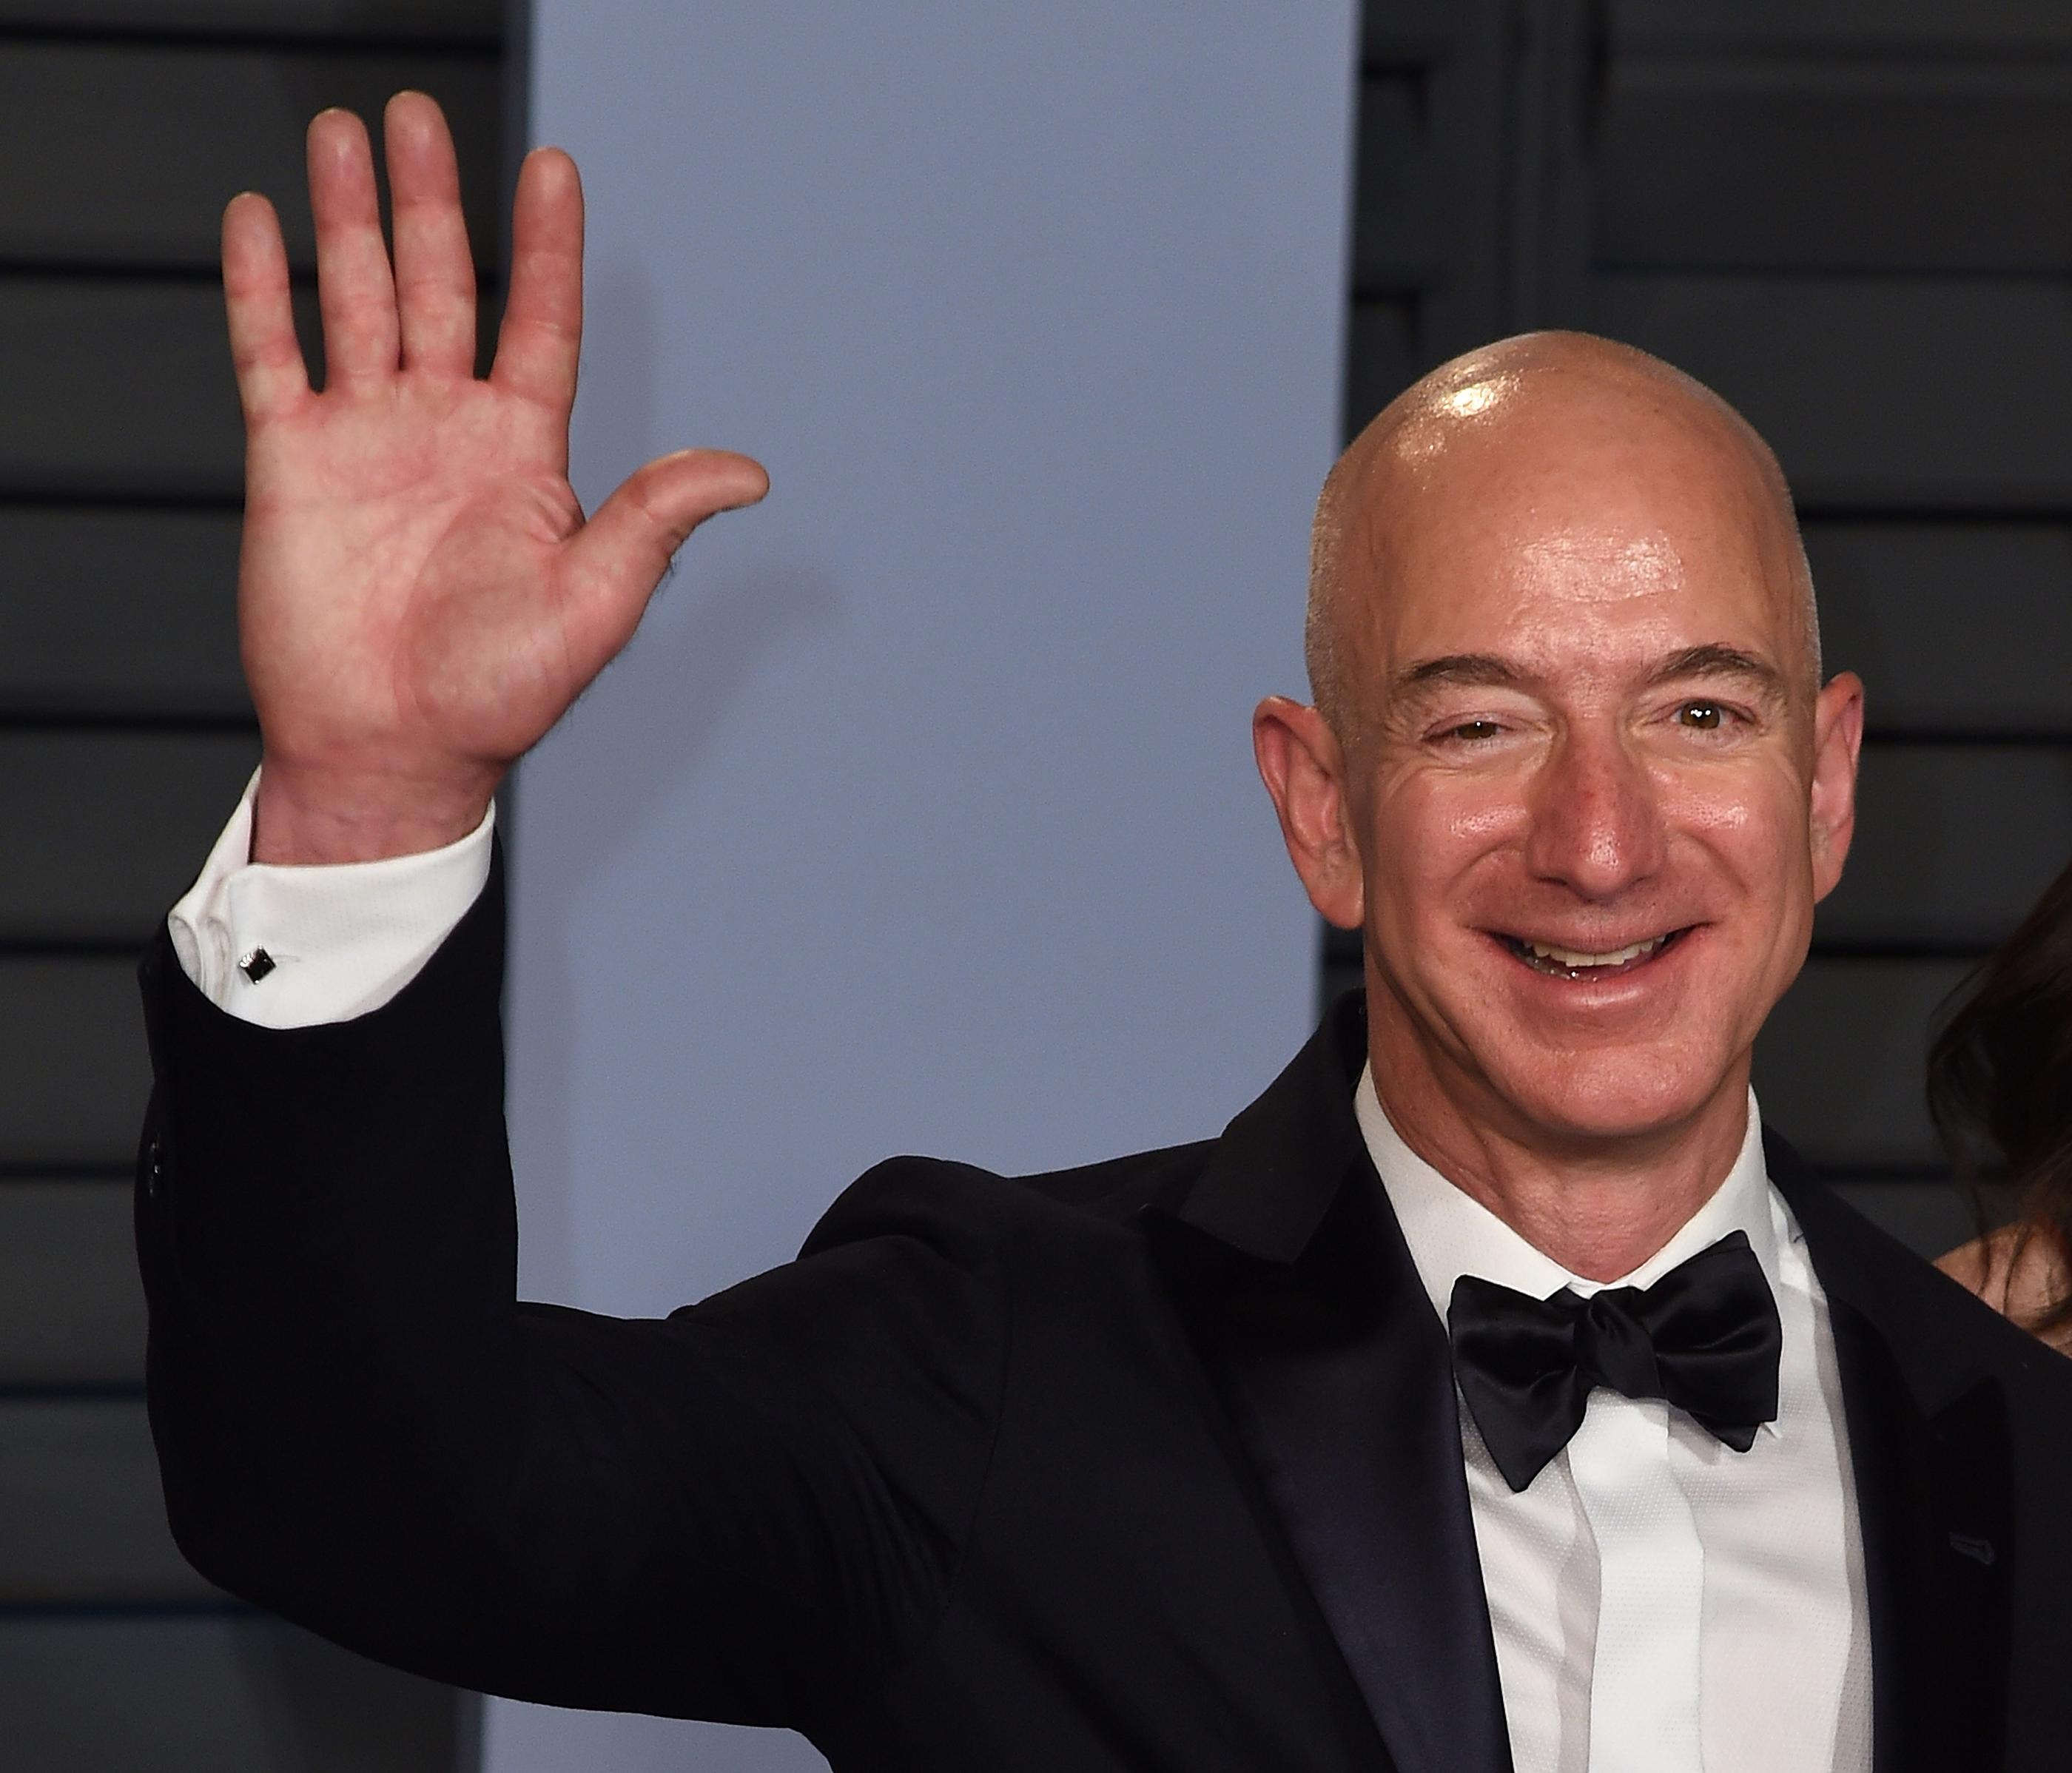 Jeff Bezos Makes The Median Amazon Salary Every 9 Seconds Money